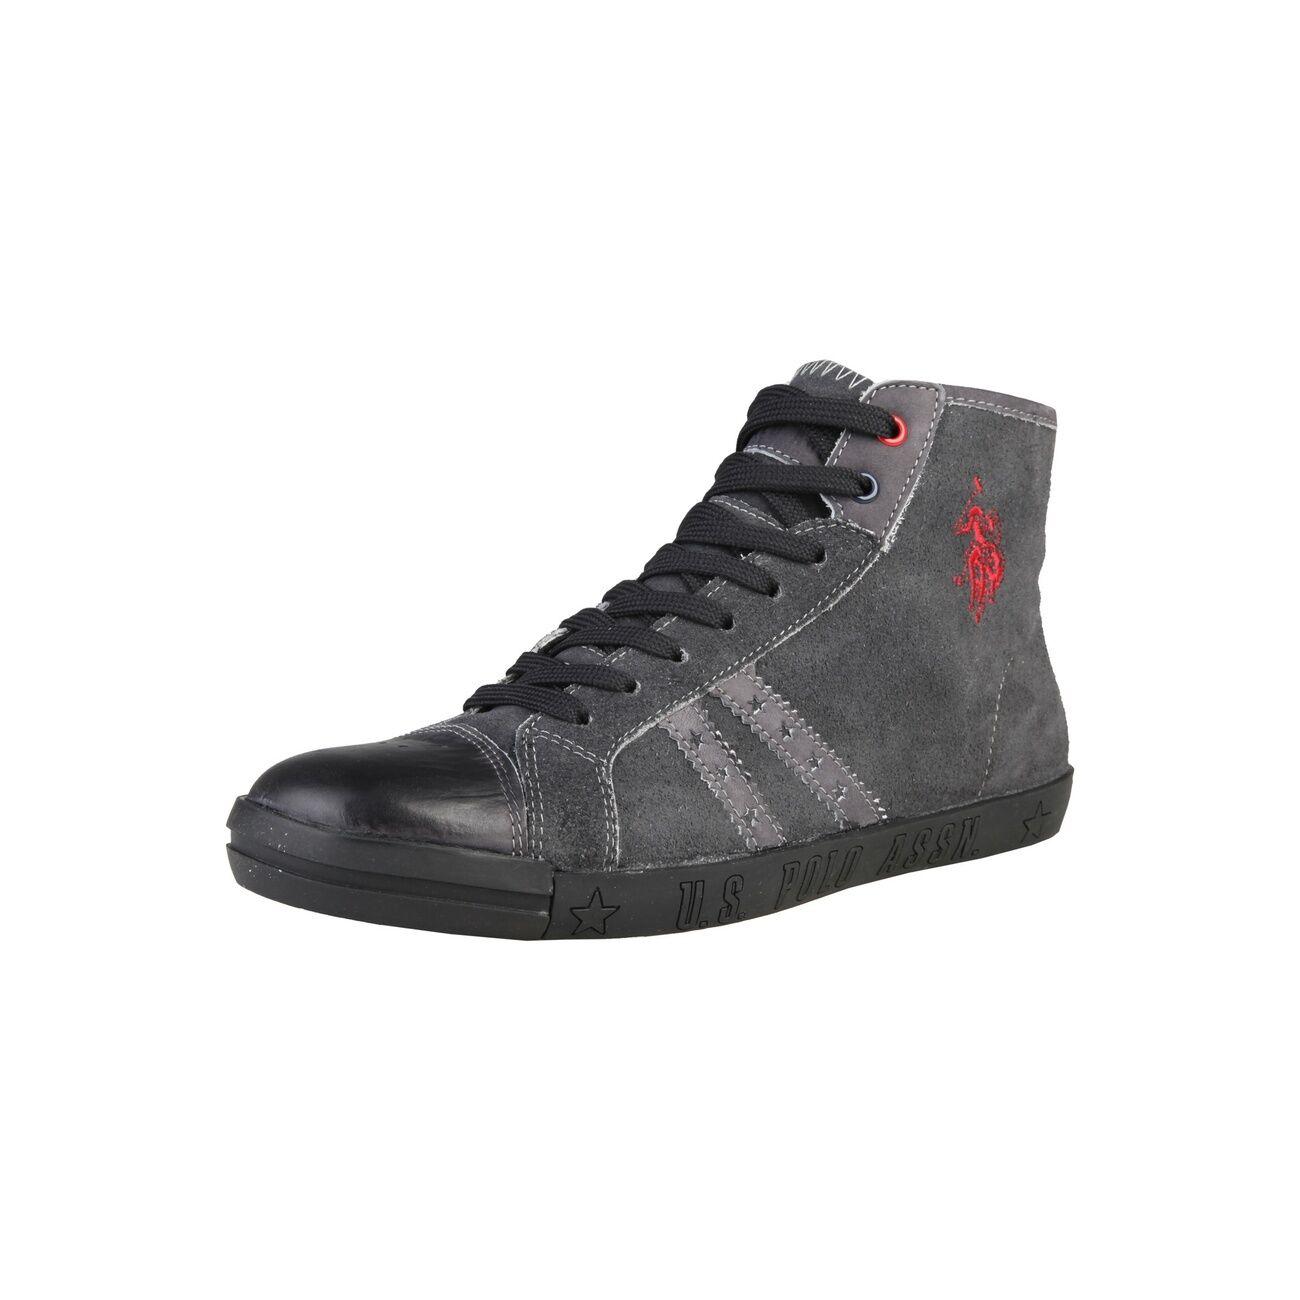 Billig Qualität hohe Qualität Billig U.S. POLO ASSN,Herren,Men,Schuhe,Schuhes,Sneaker,NEU,Dunkel Blau,Blau,Navy,Leder, 4b4e78